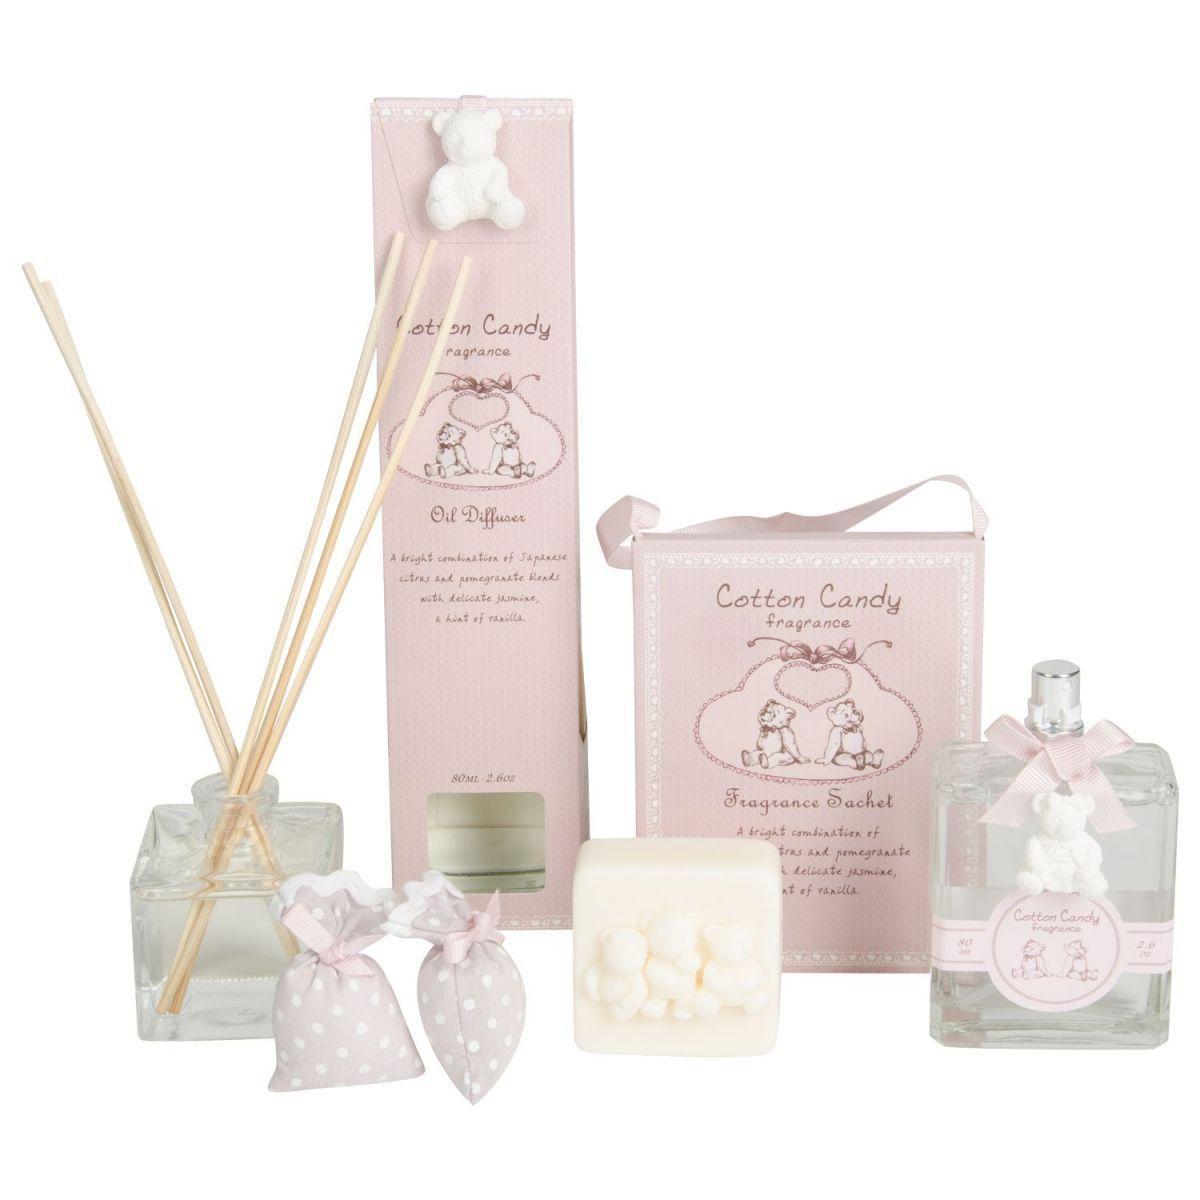 cotton candy fragance sachet art craft gift box